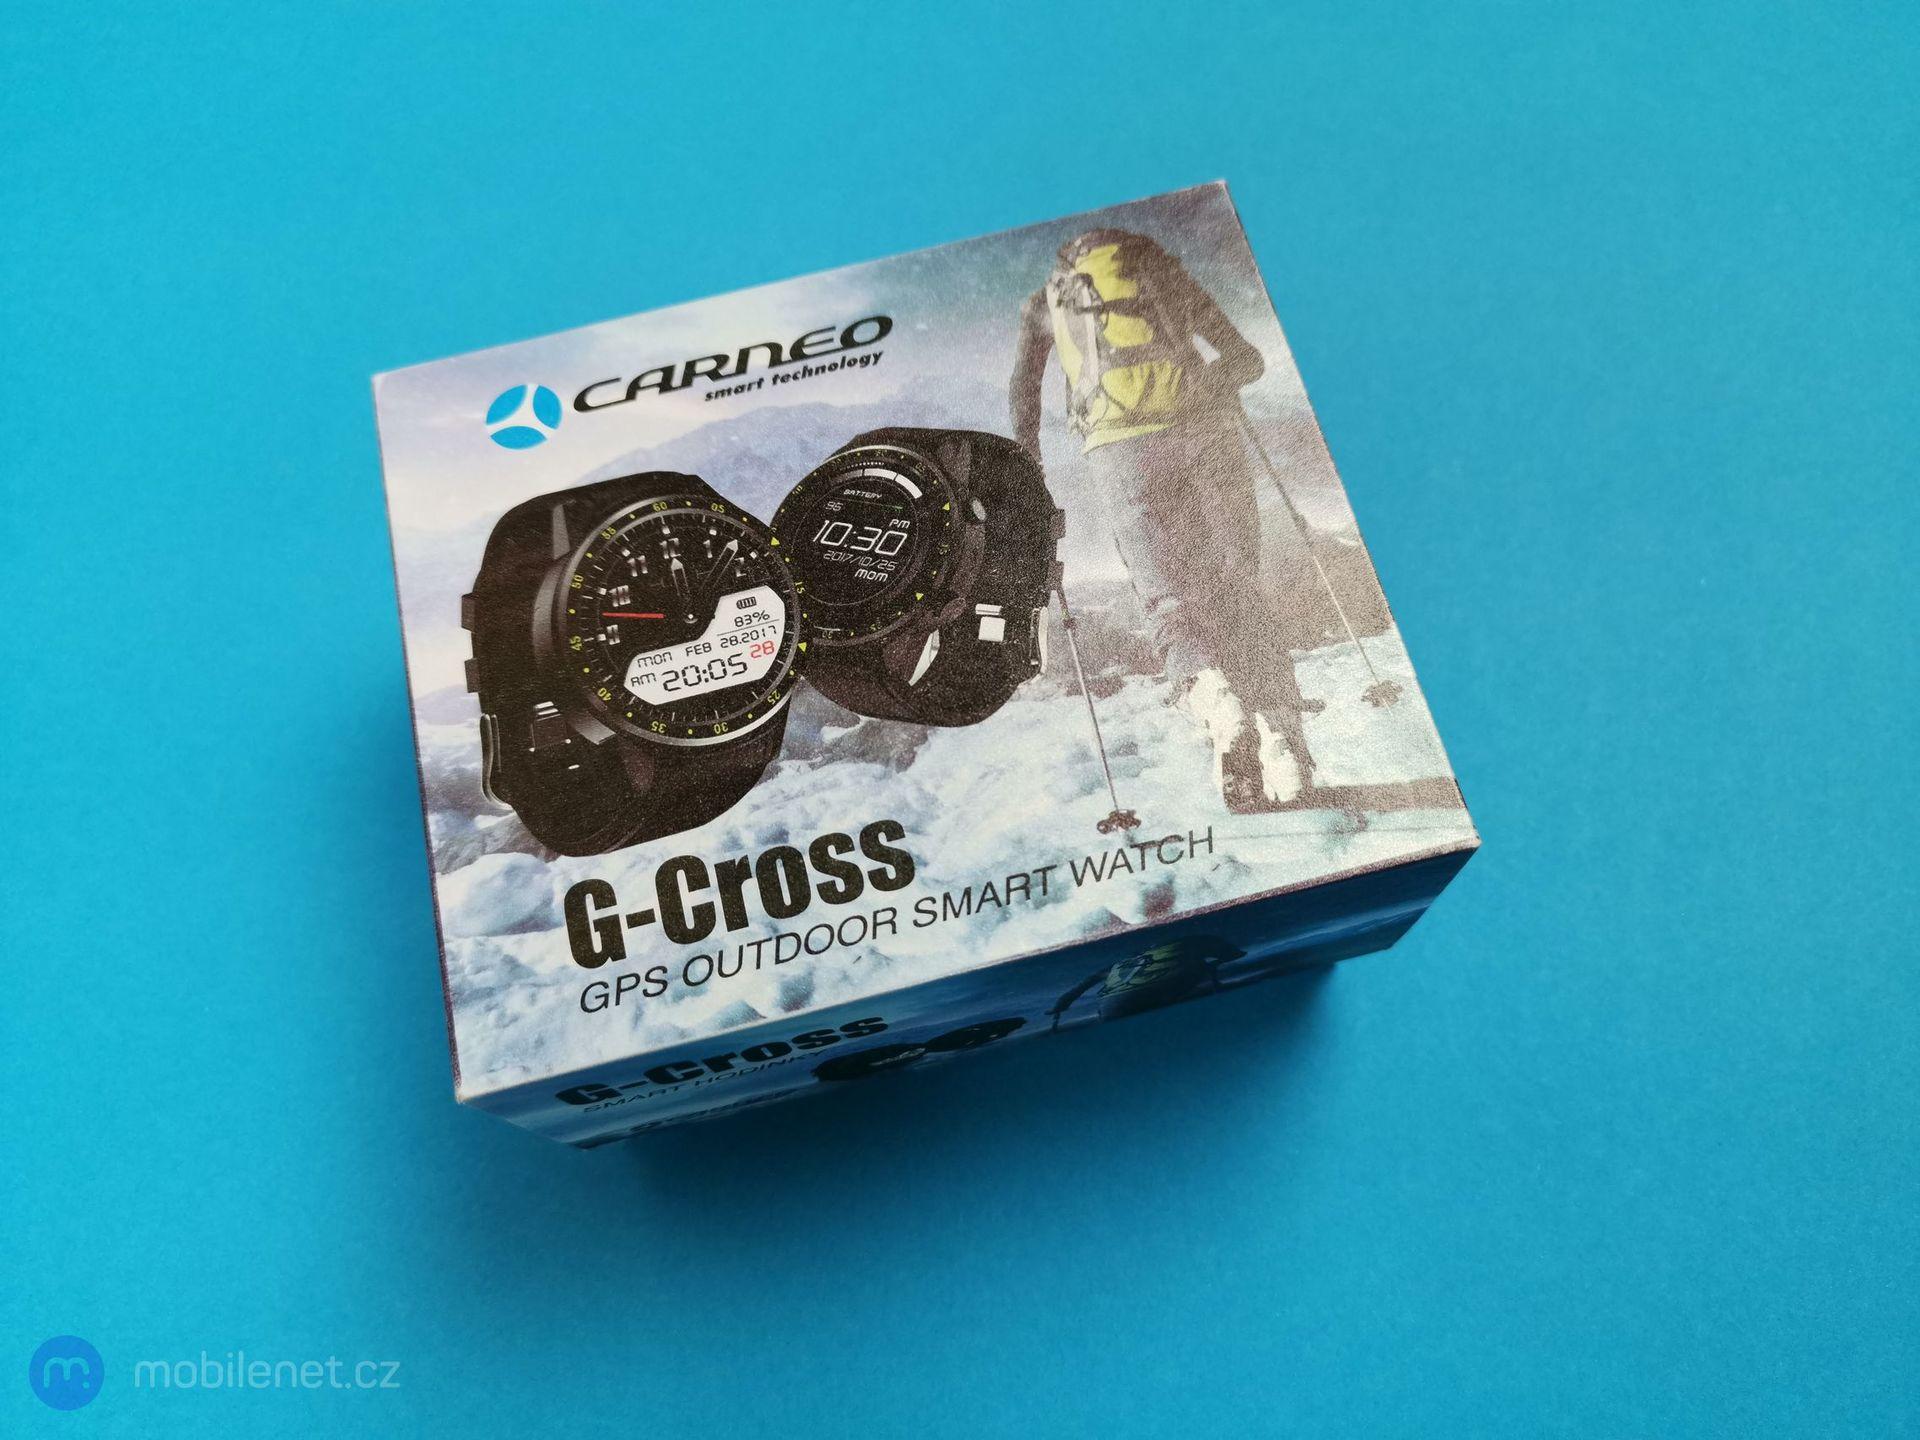 CARNEO G-Cross